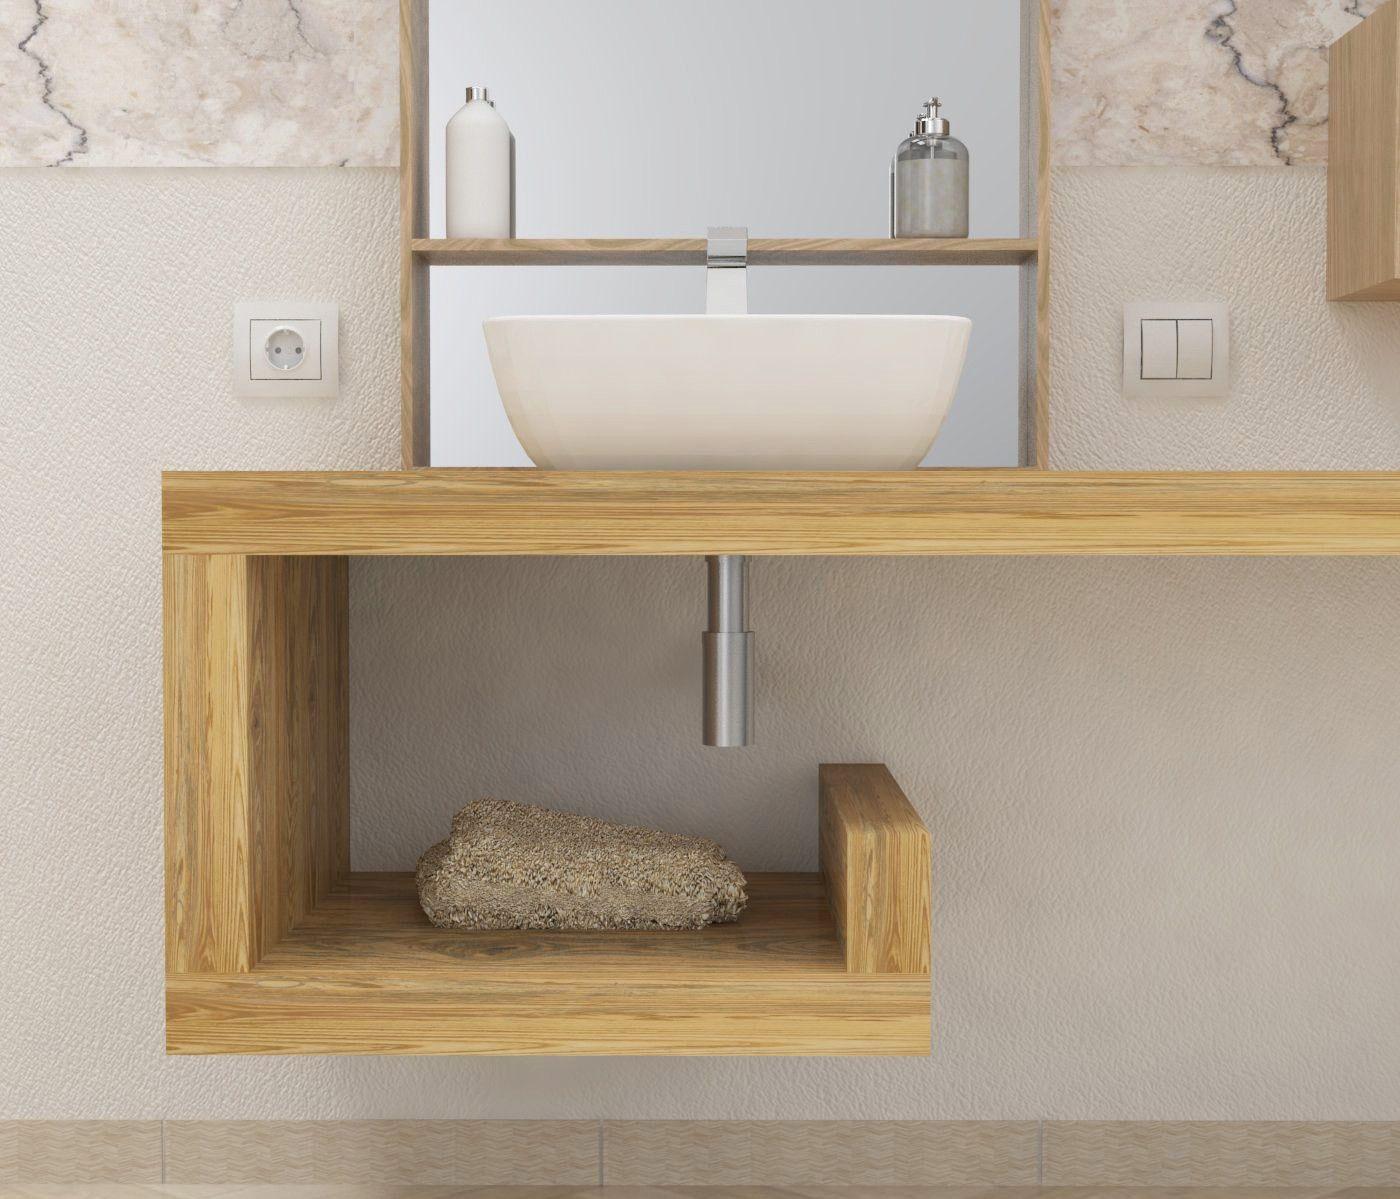 Image Result For Meuble Salle De Bain Tablette Bois Massif Single Vanity Vanity Bathroom Vanity